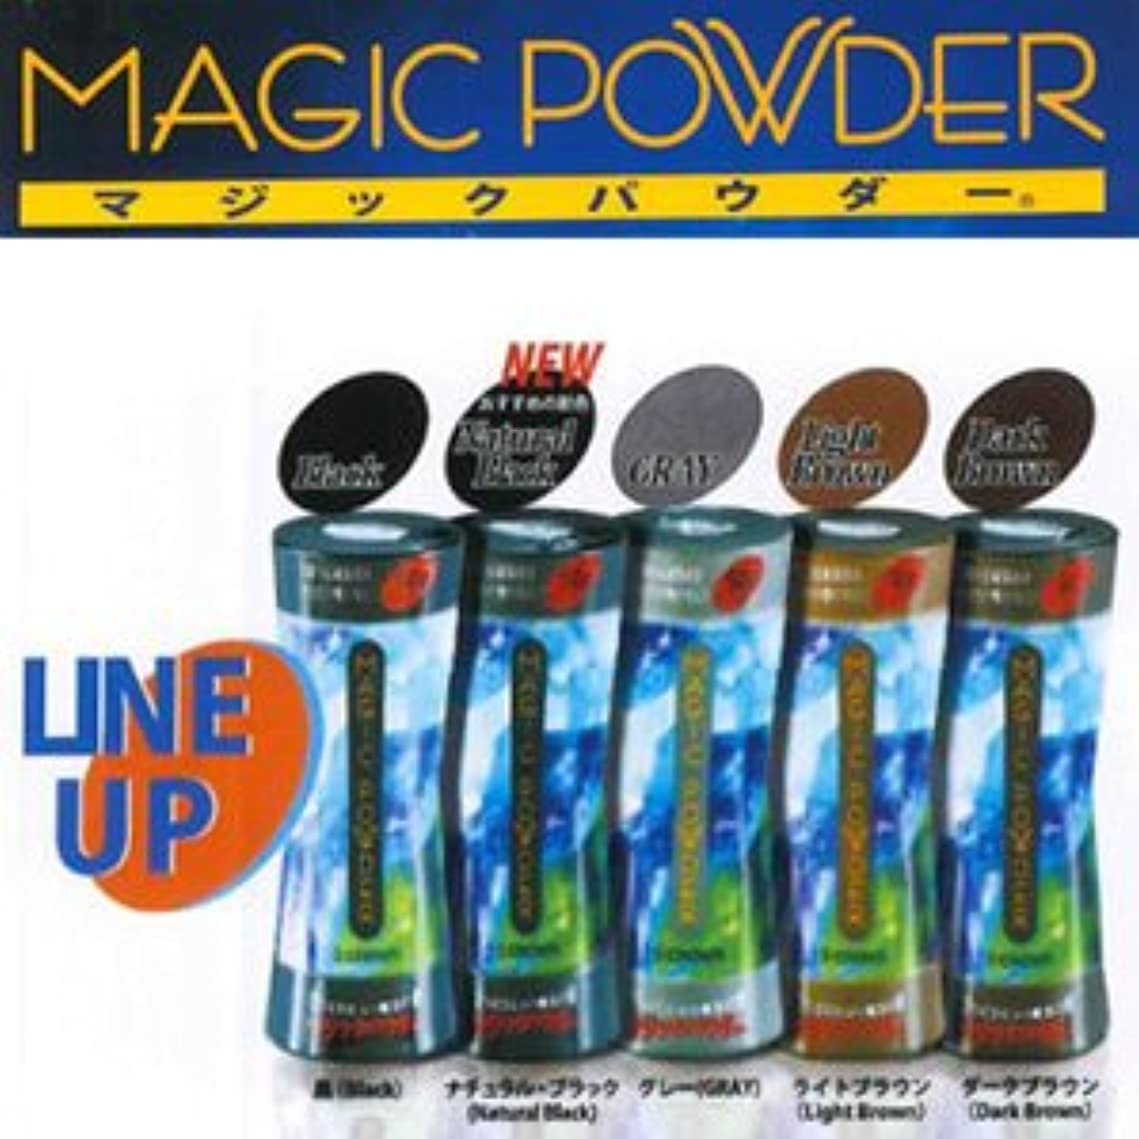 MAGIC POWDER マジックパウダー ブラック 50g  ※貴方の髪を簡単ボリュームアップ!